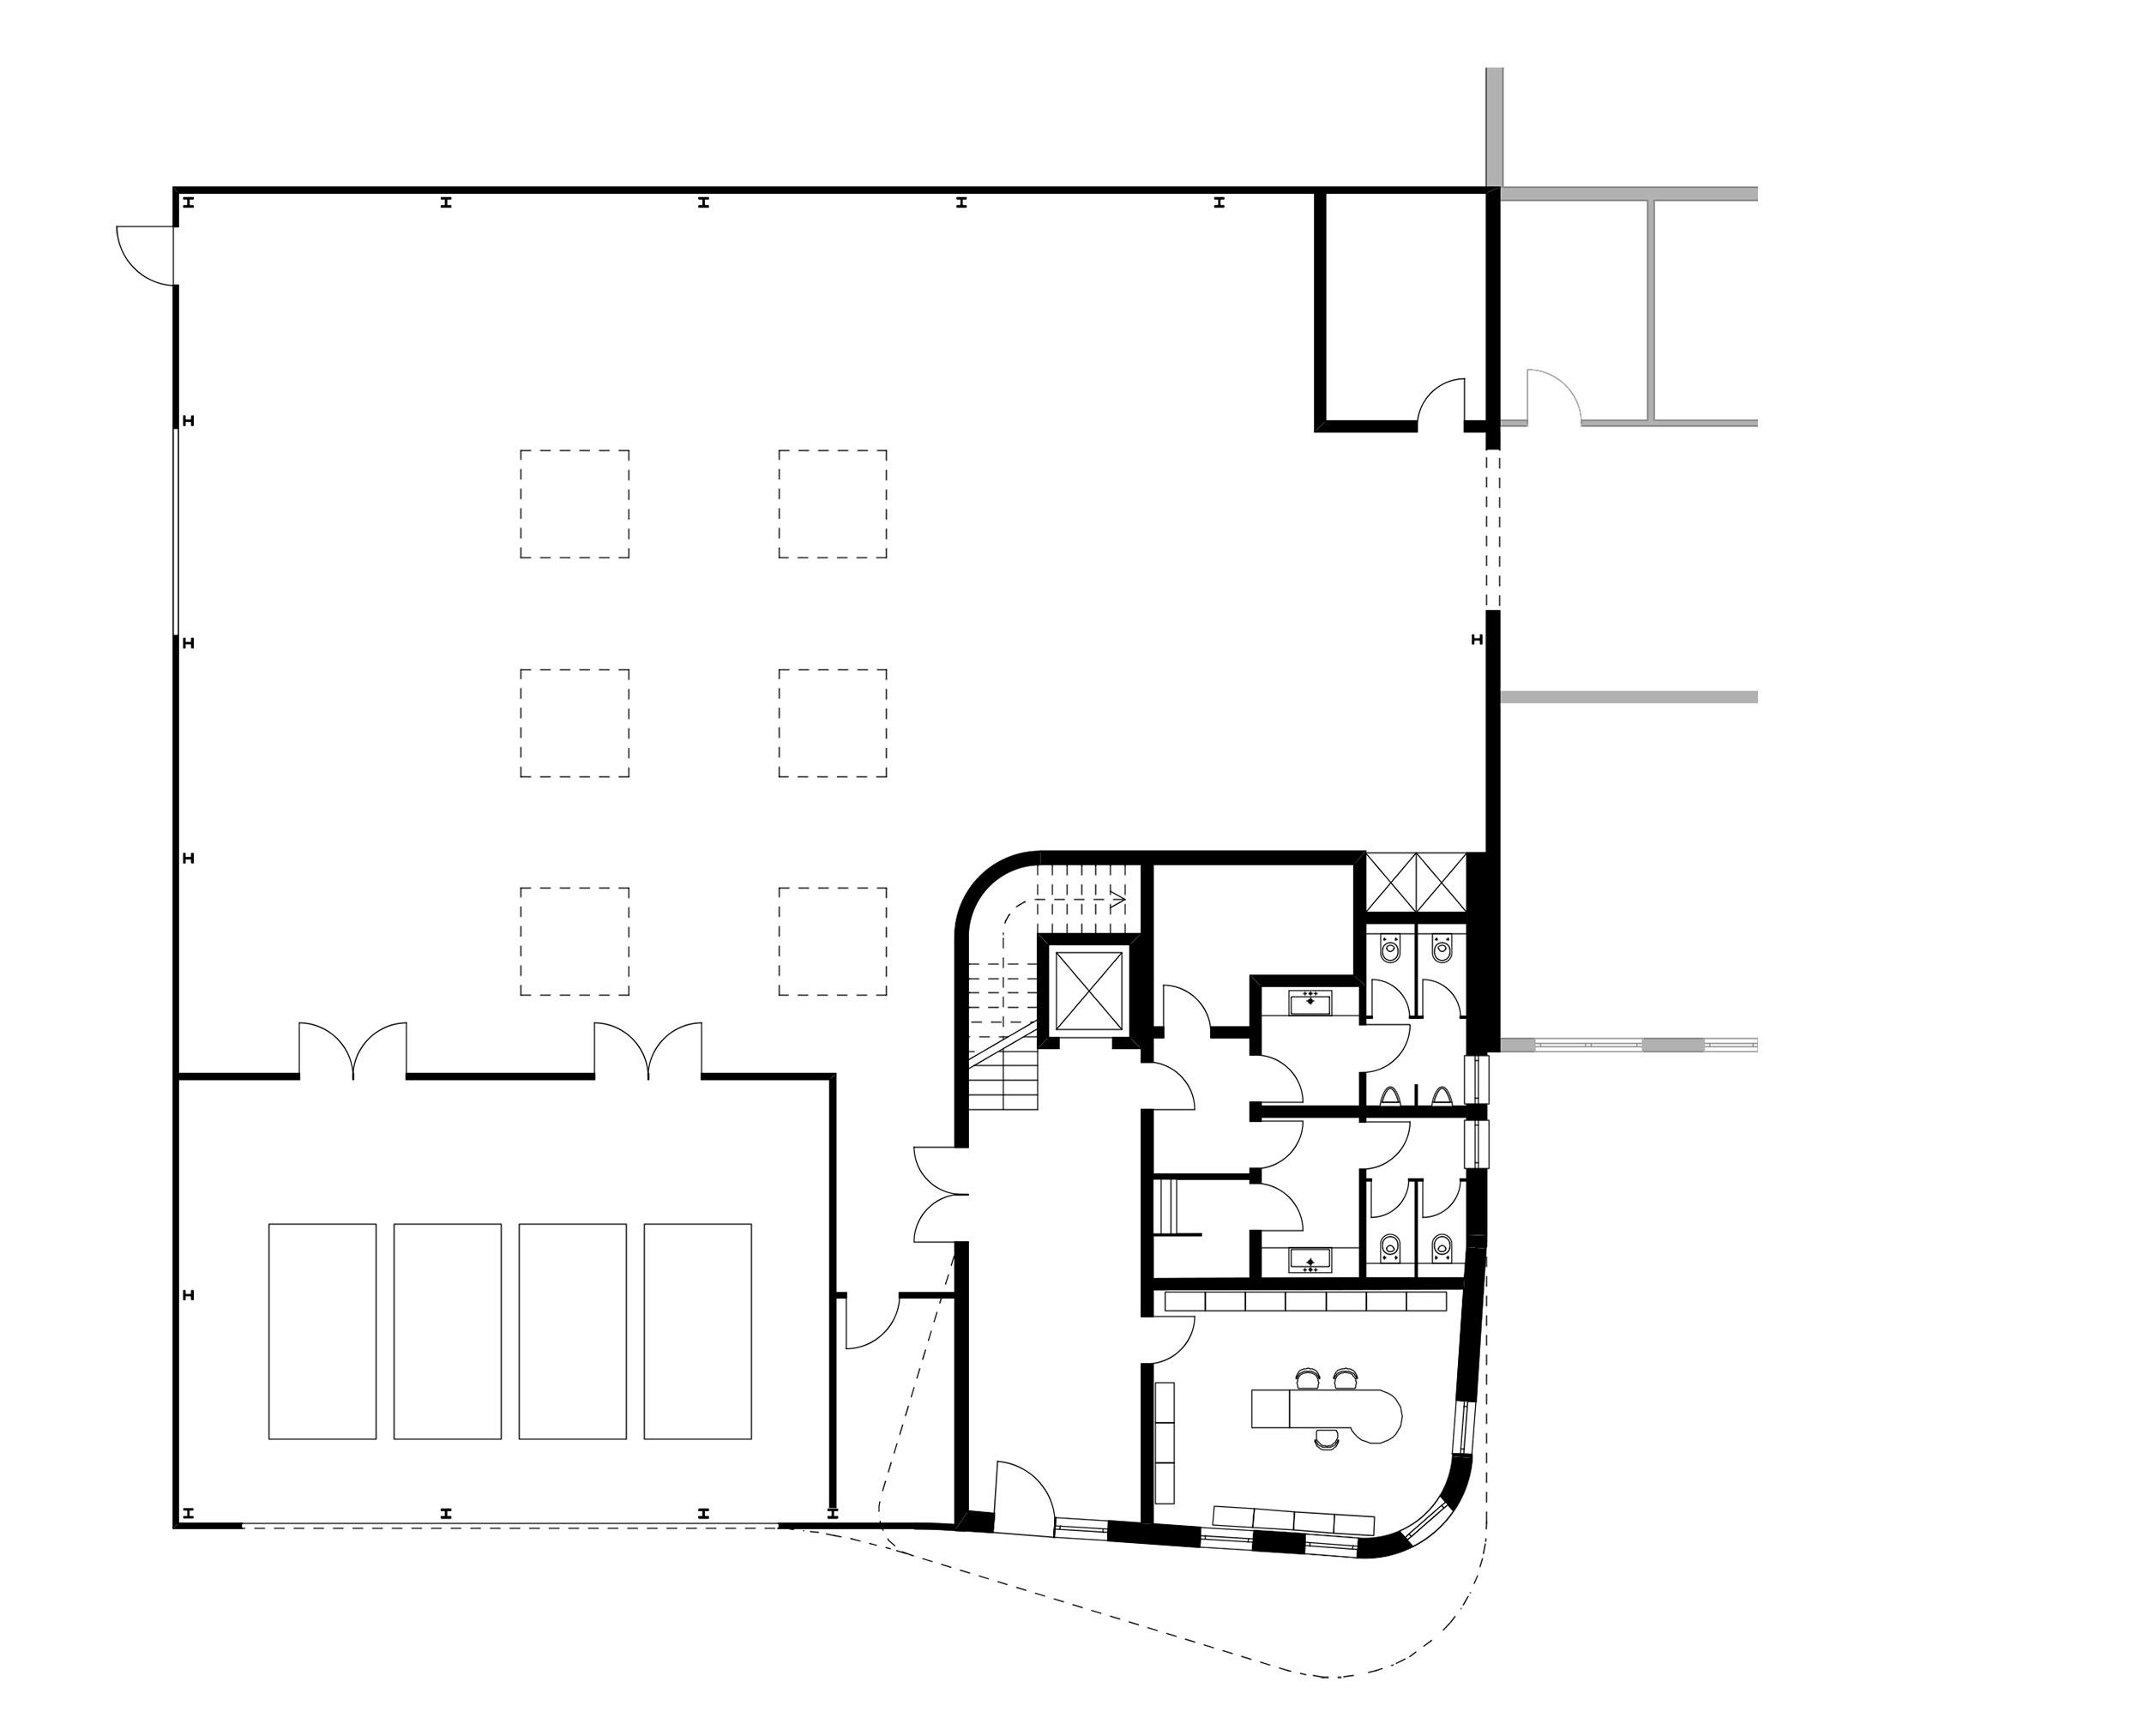 Henecka Architektur